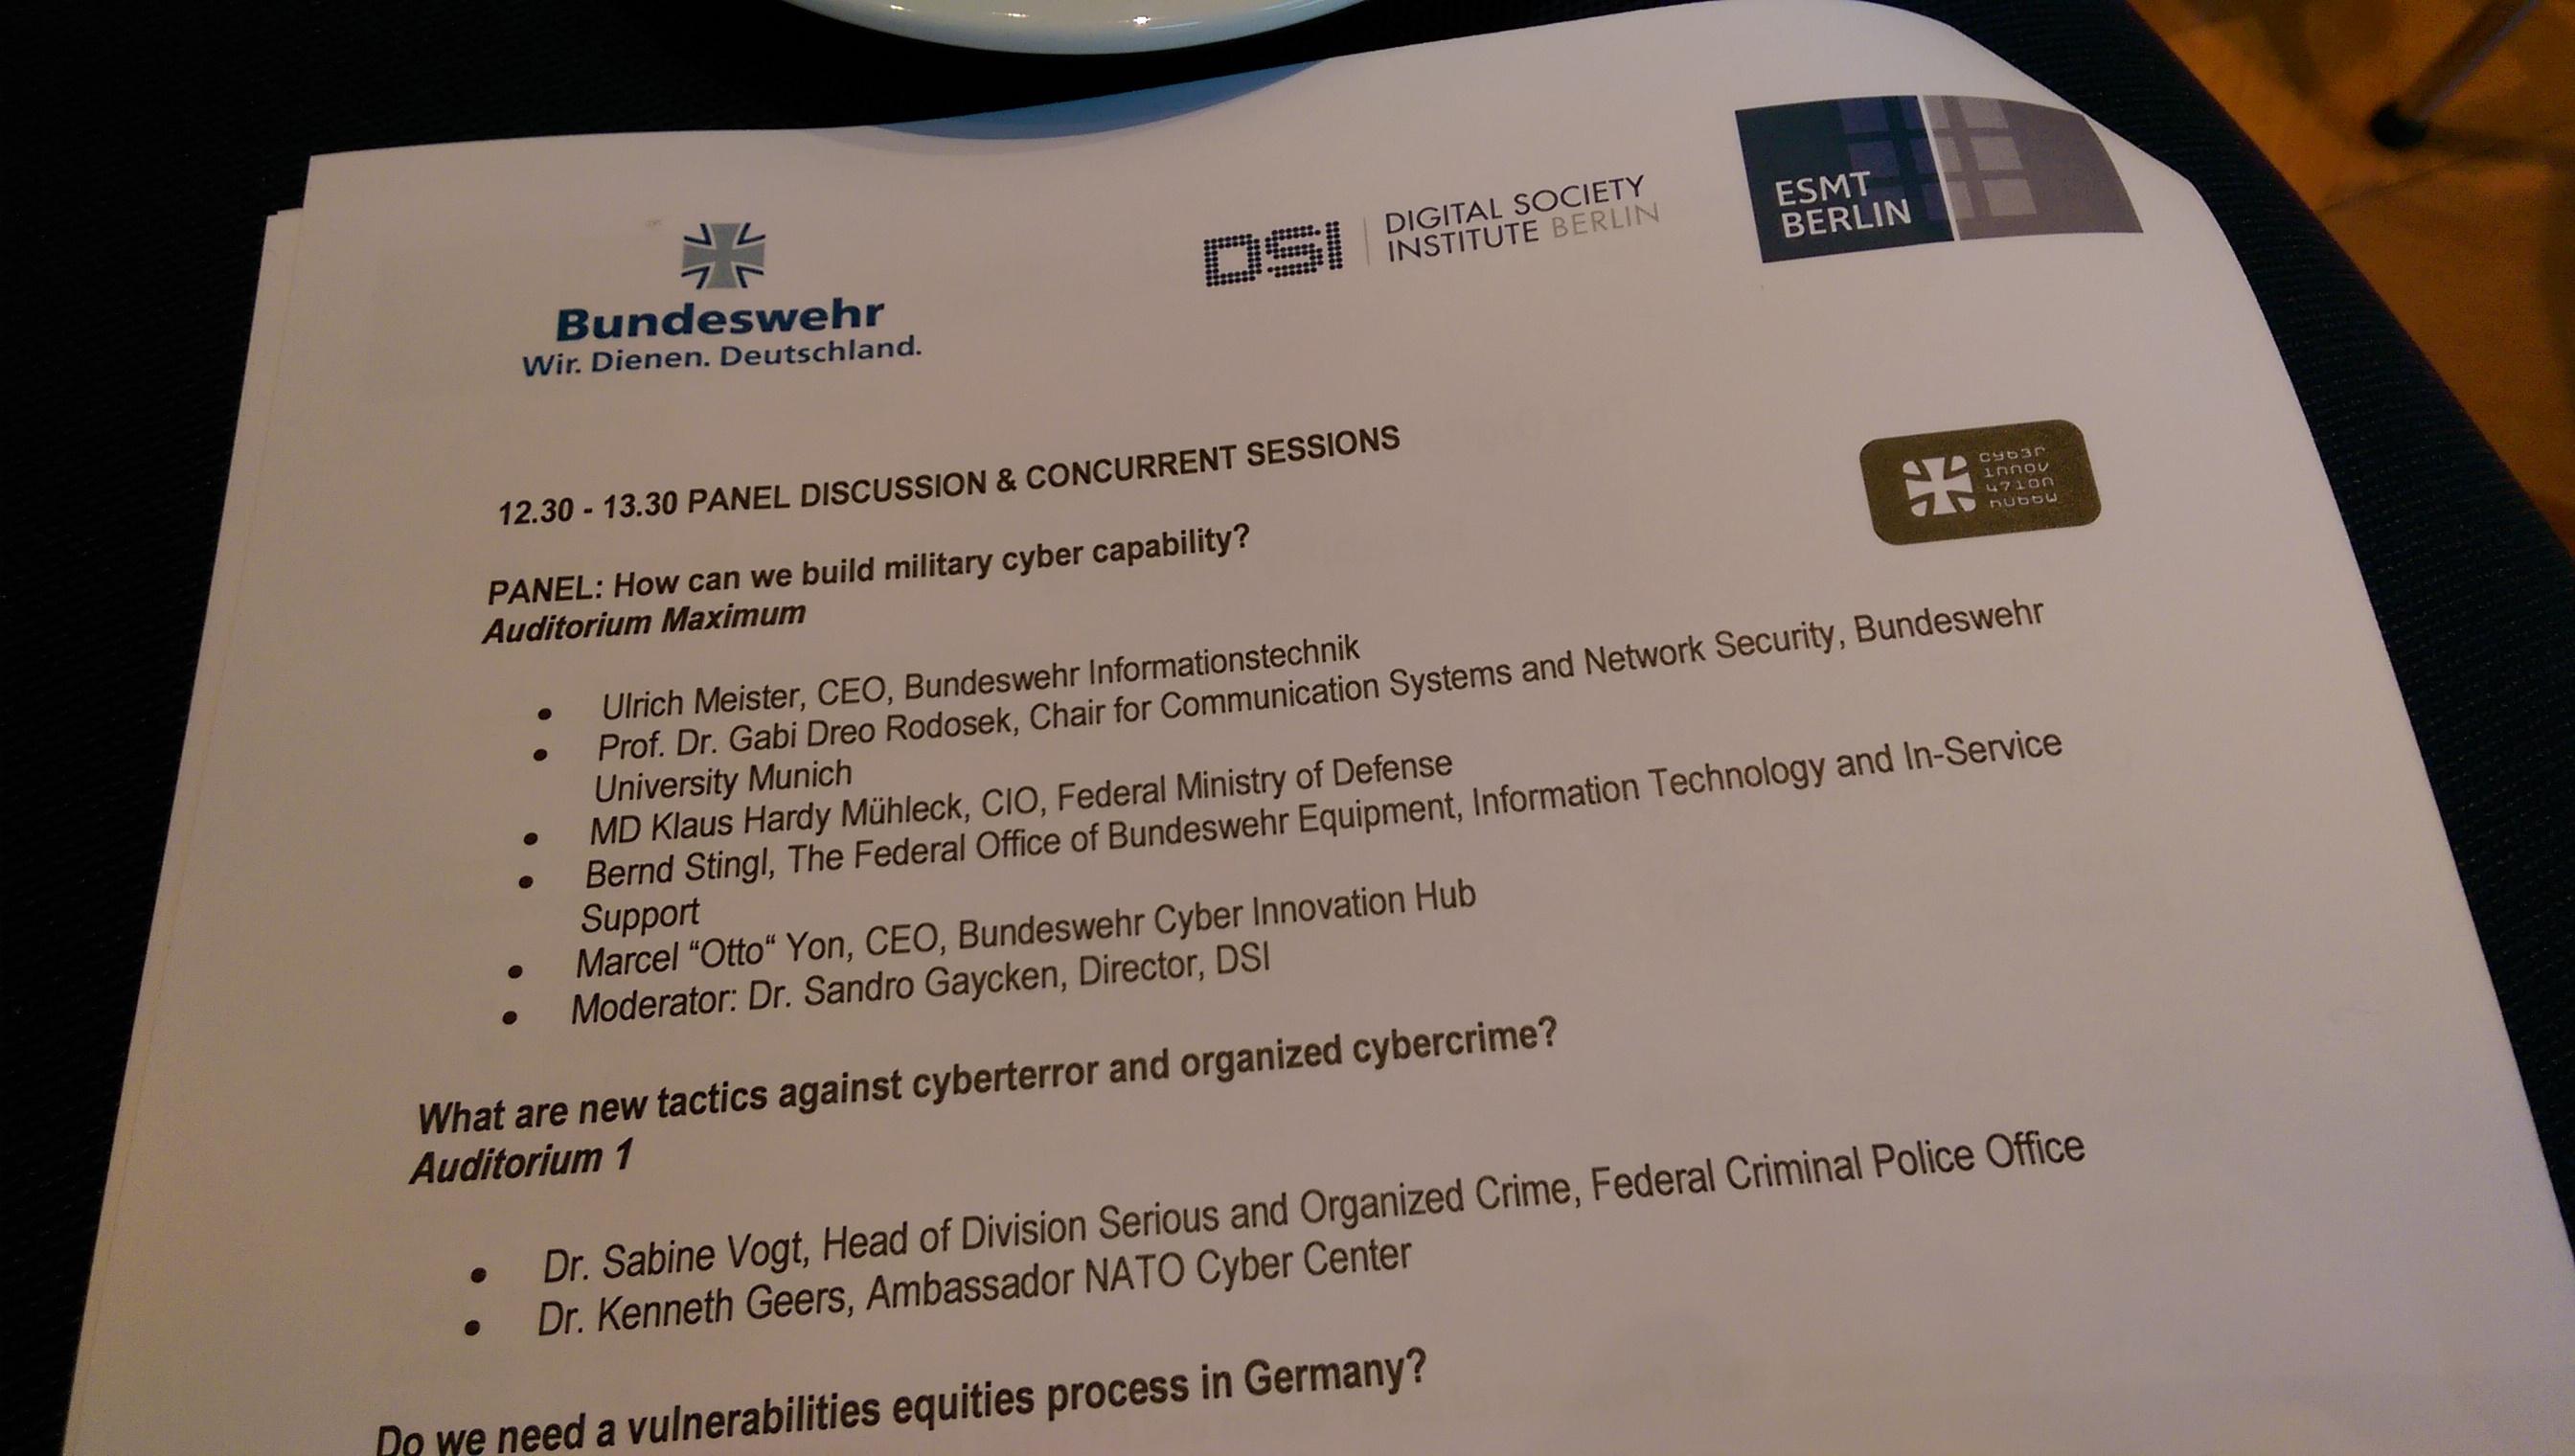 Digital Society Conference Berlin